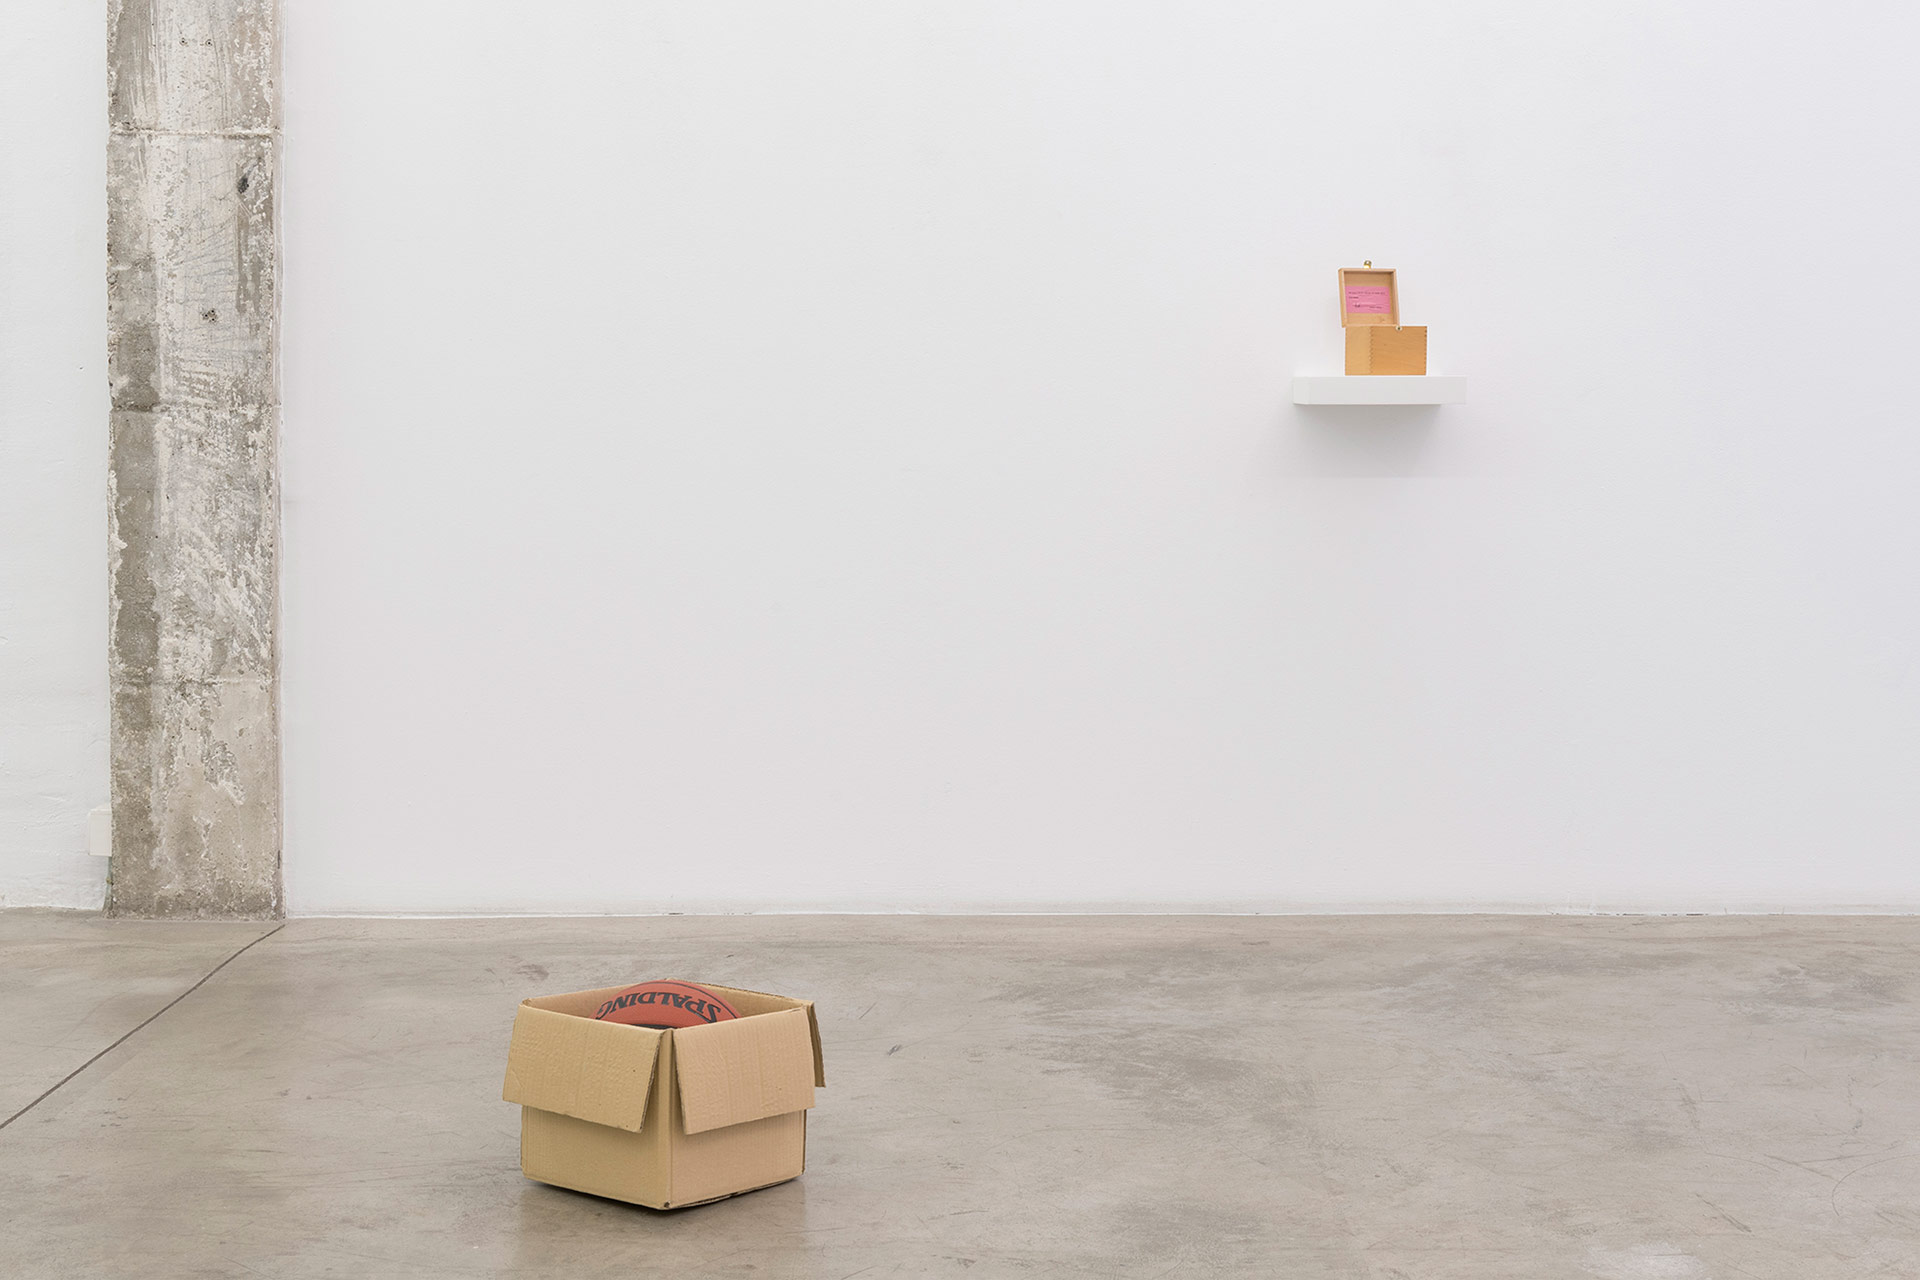 Wilfredo Prieto, Robert Filliou, Galería Nogueras Blanchard, Madrid